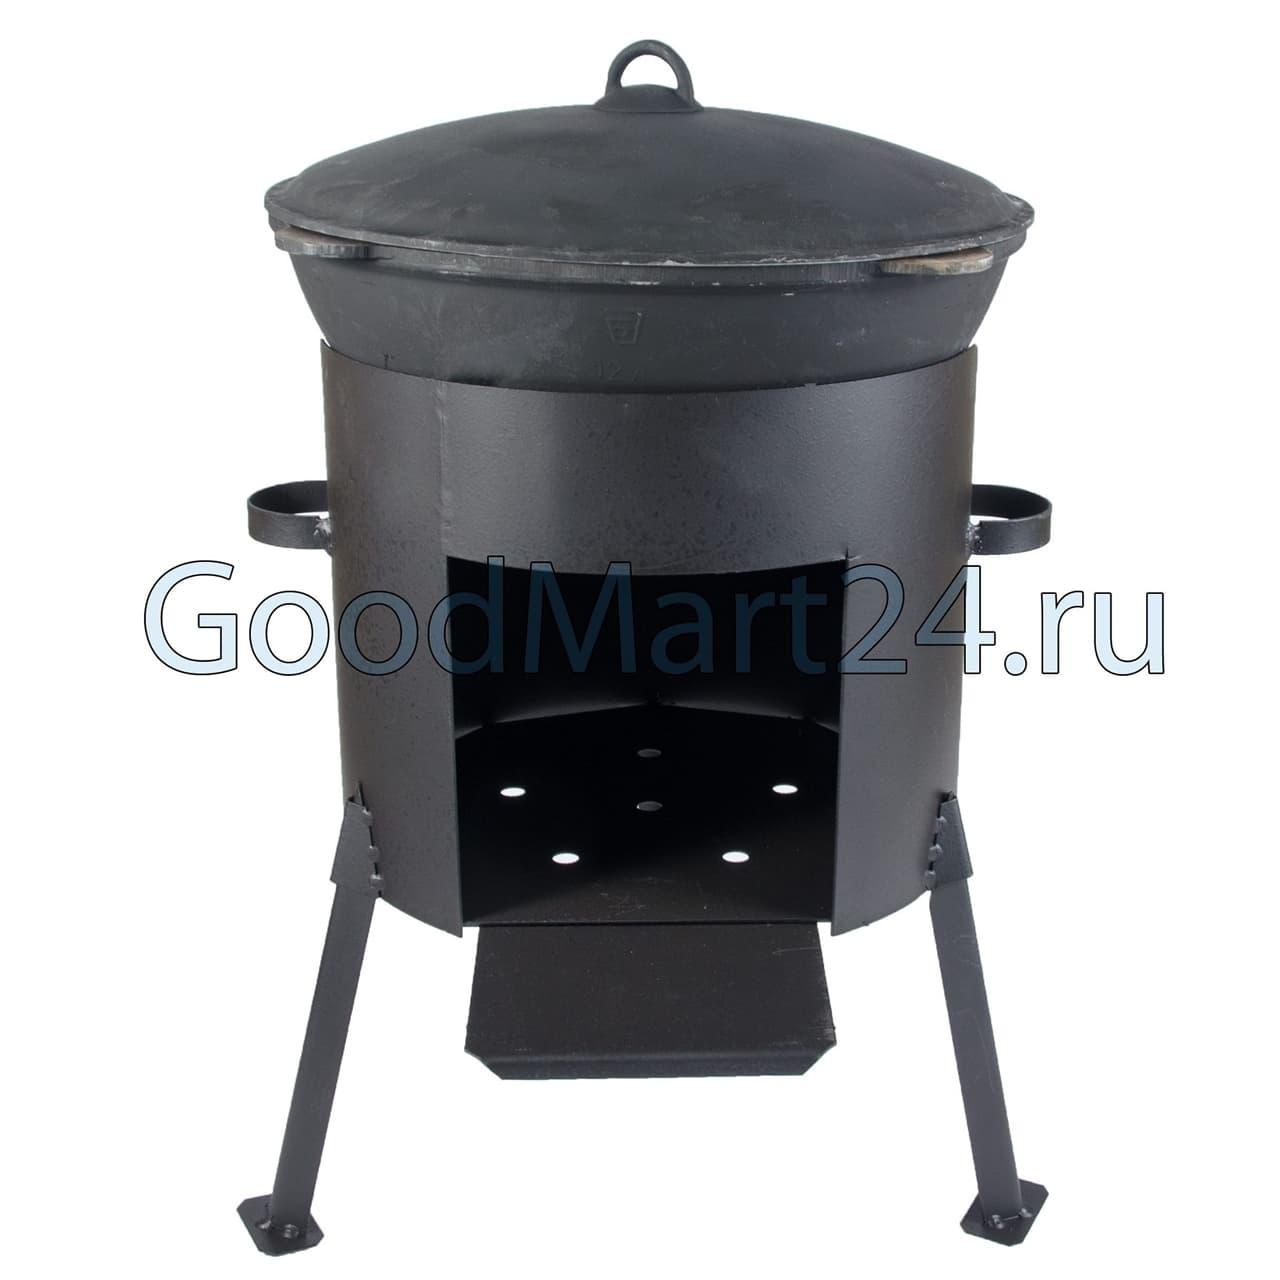 чугунный казан 8 л БЛМЗ + печь D-340 ММ сталь 2 ММ фото